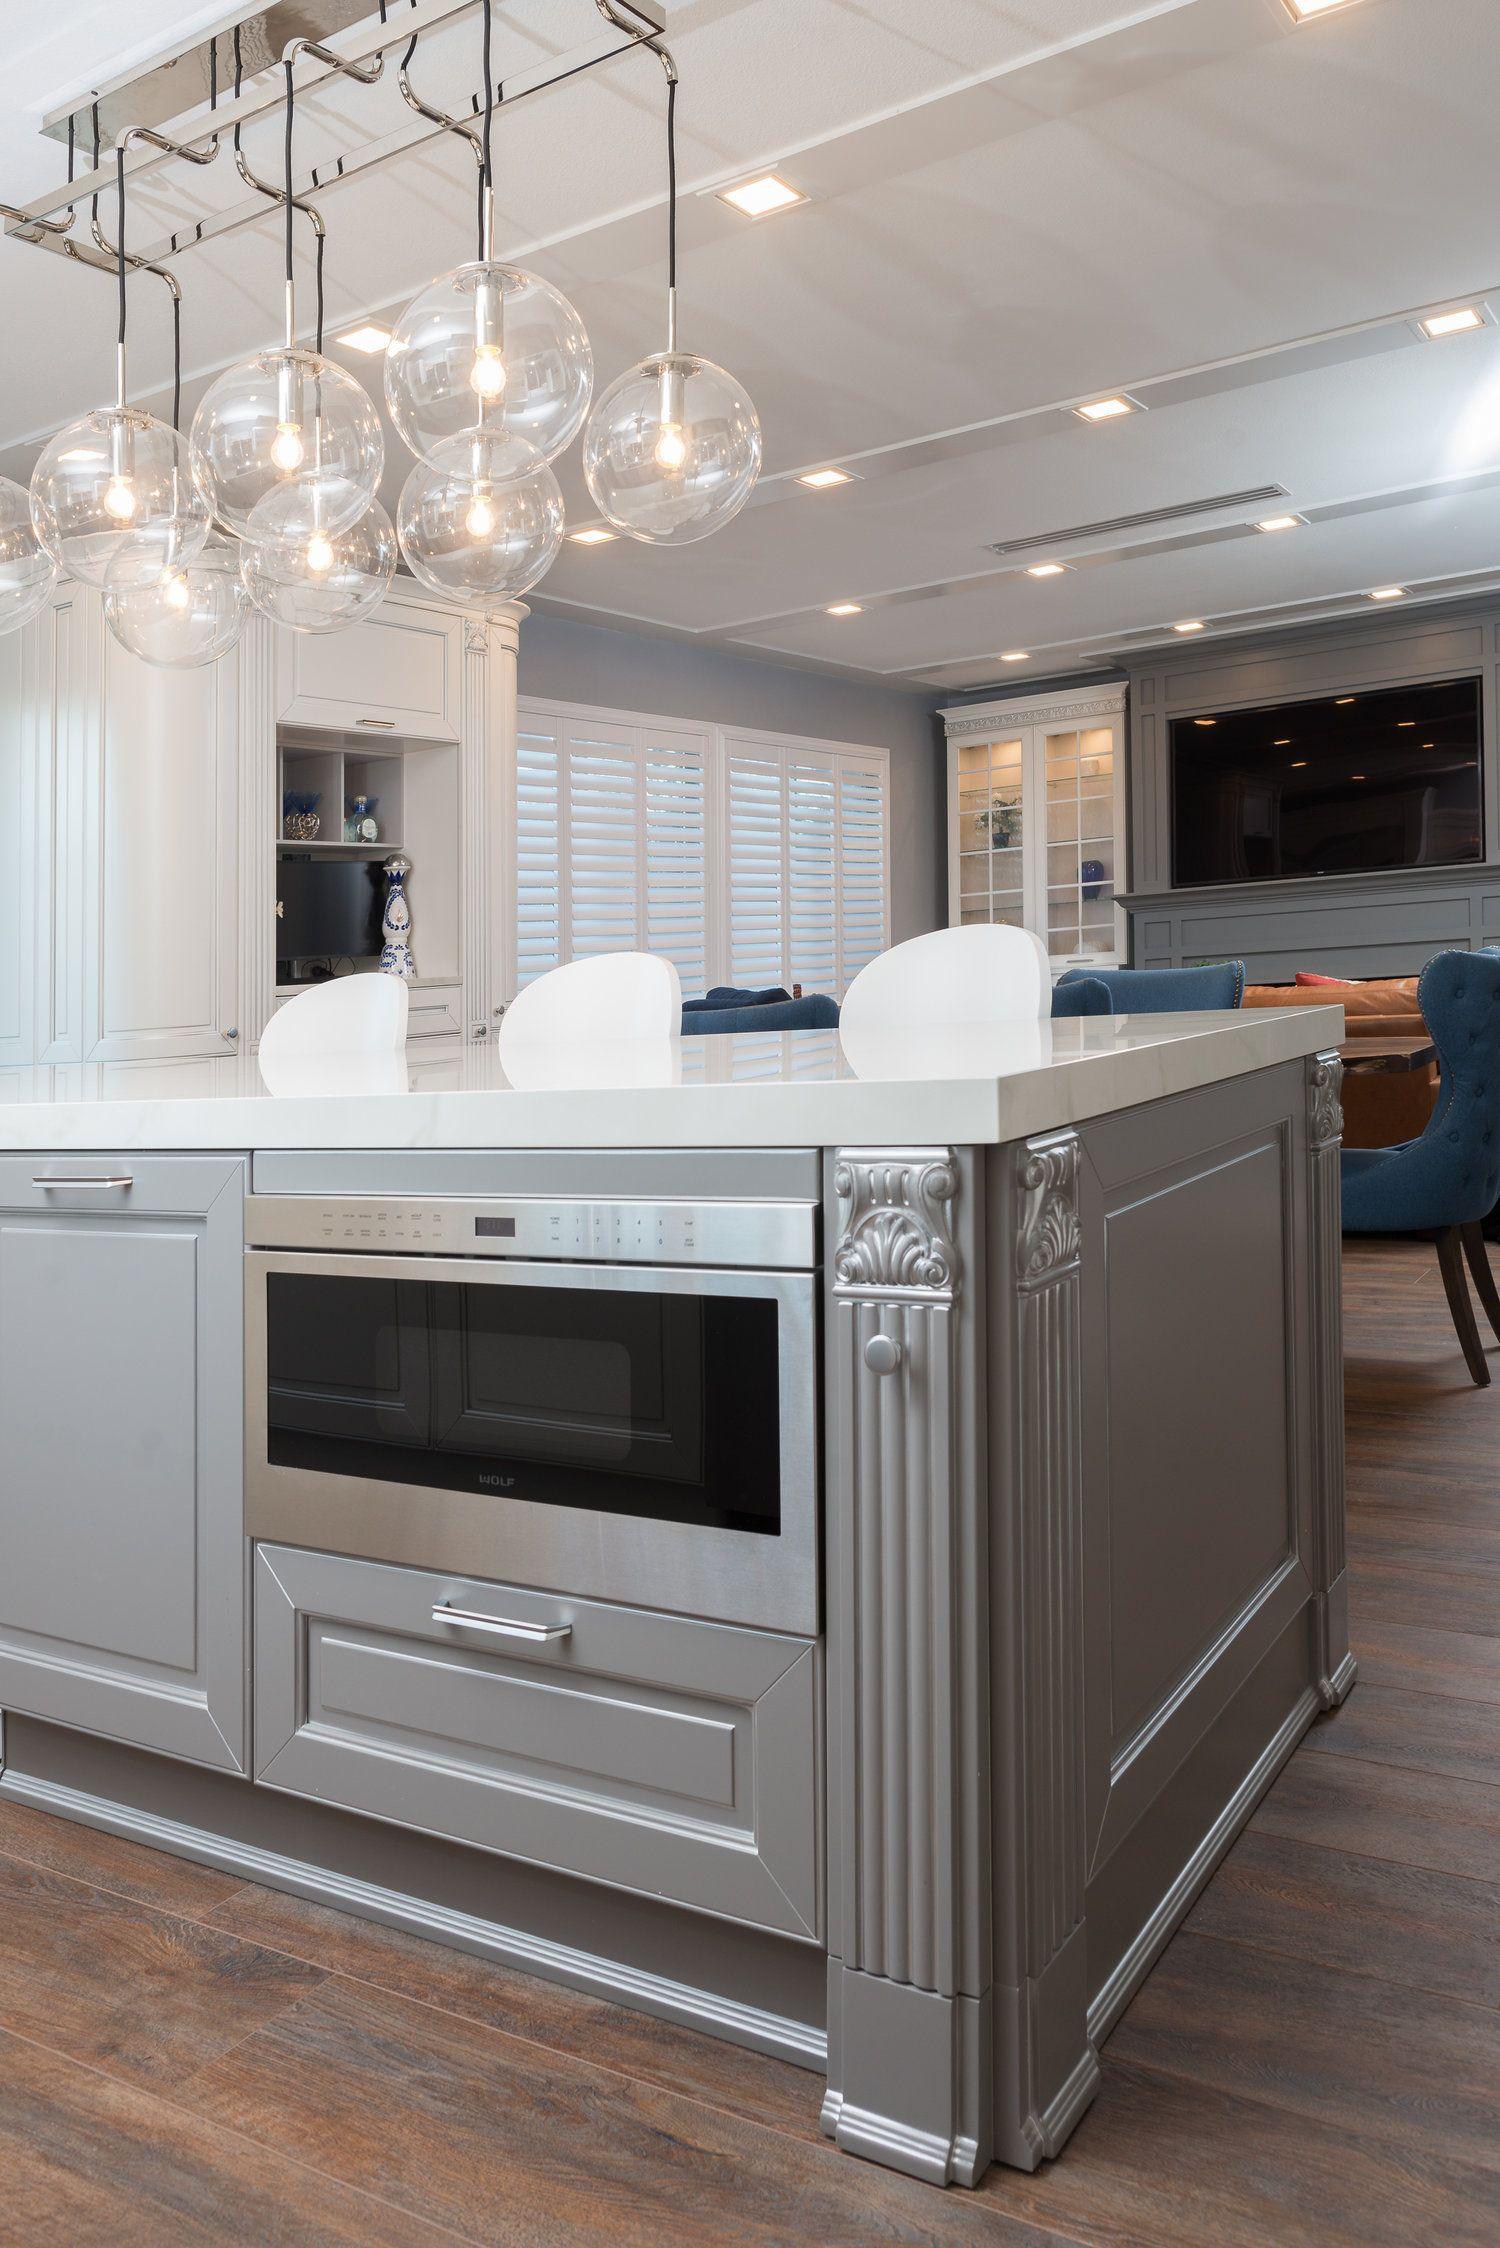 1700 Crossroads Street Chula Vista 26 Jpg Home Remodeling Kitchen Cabinets In Bathroom European Kitchens